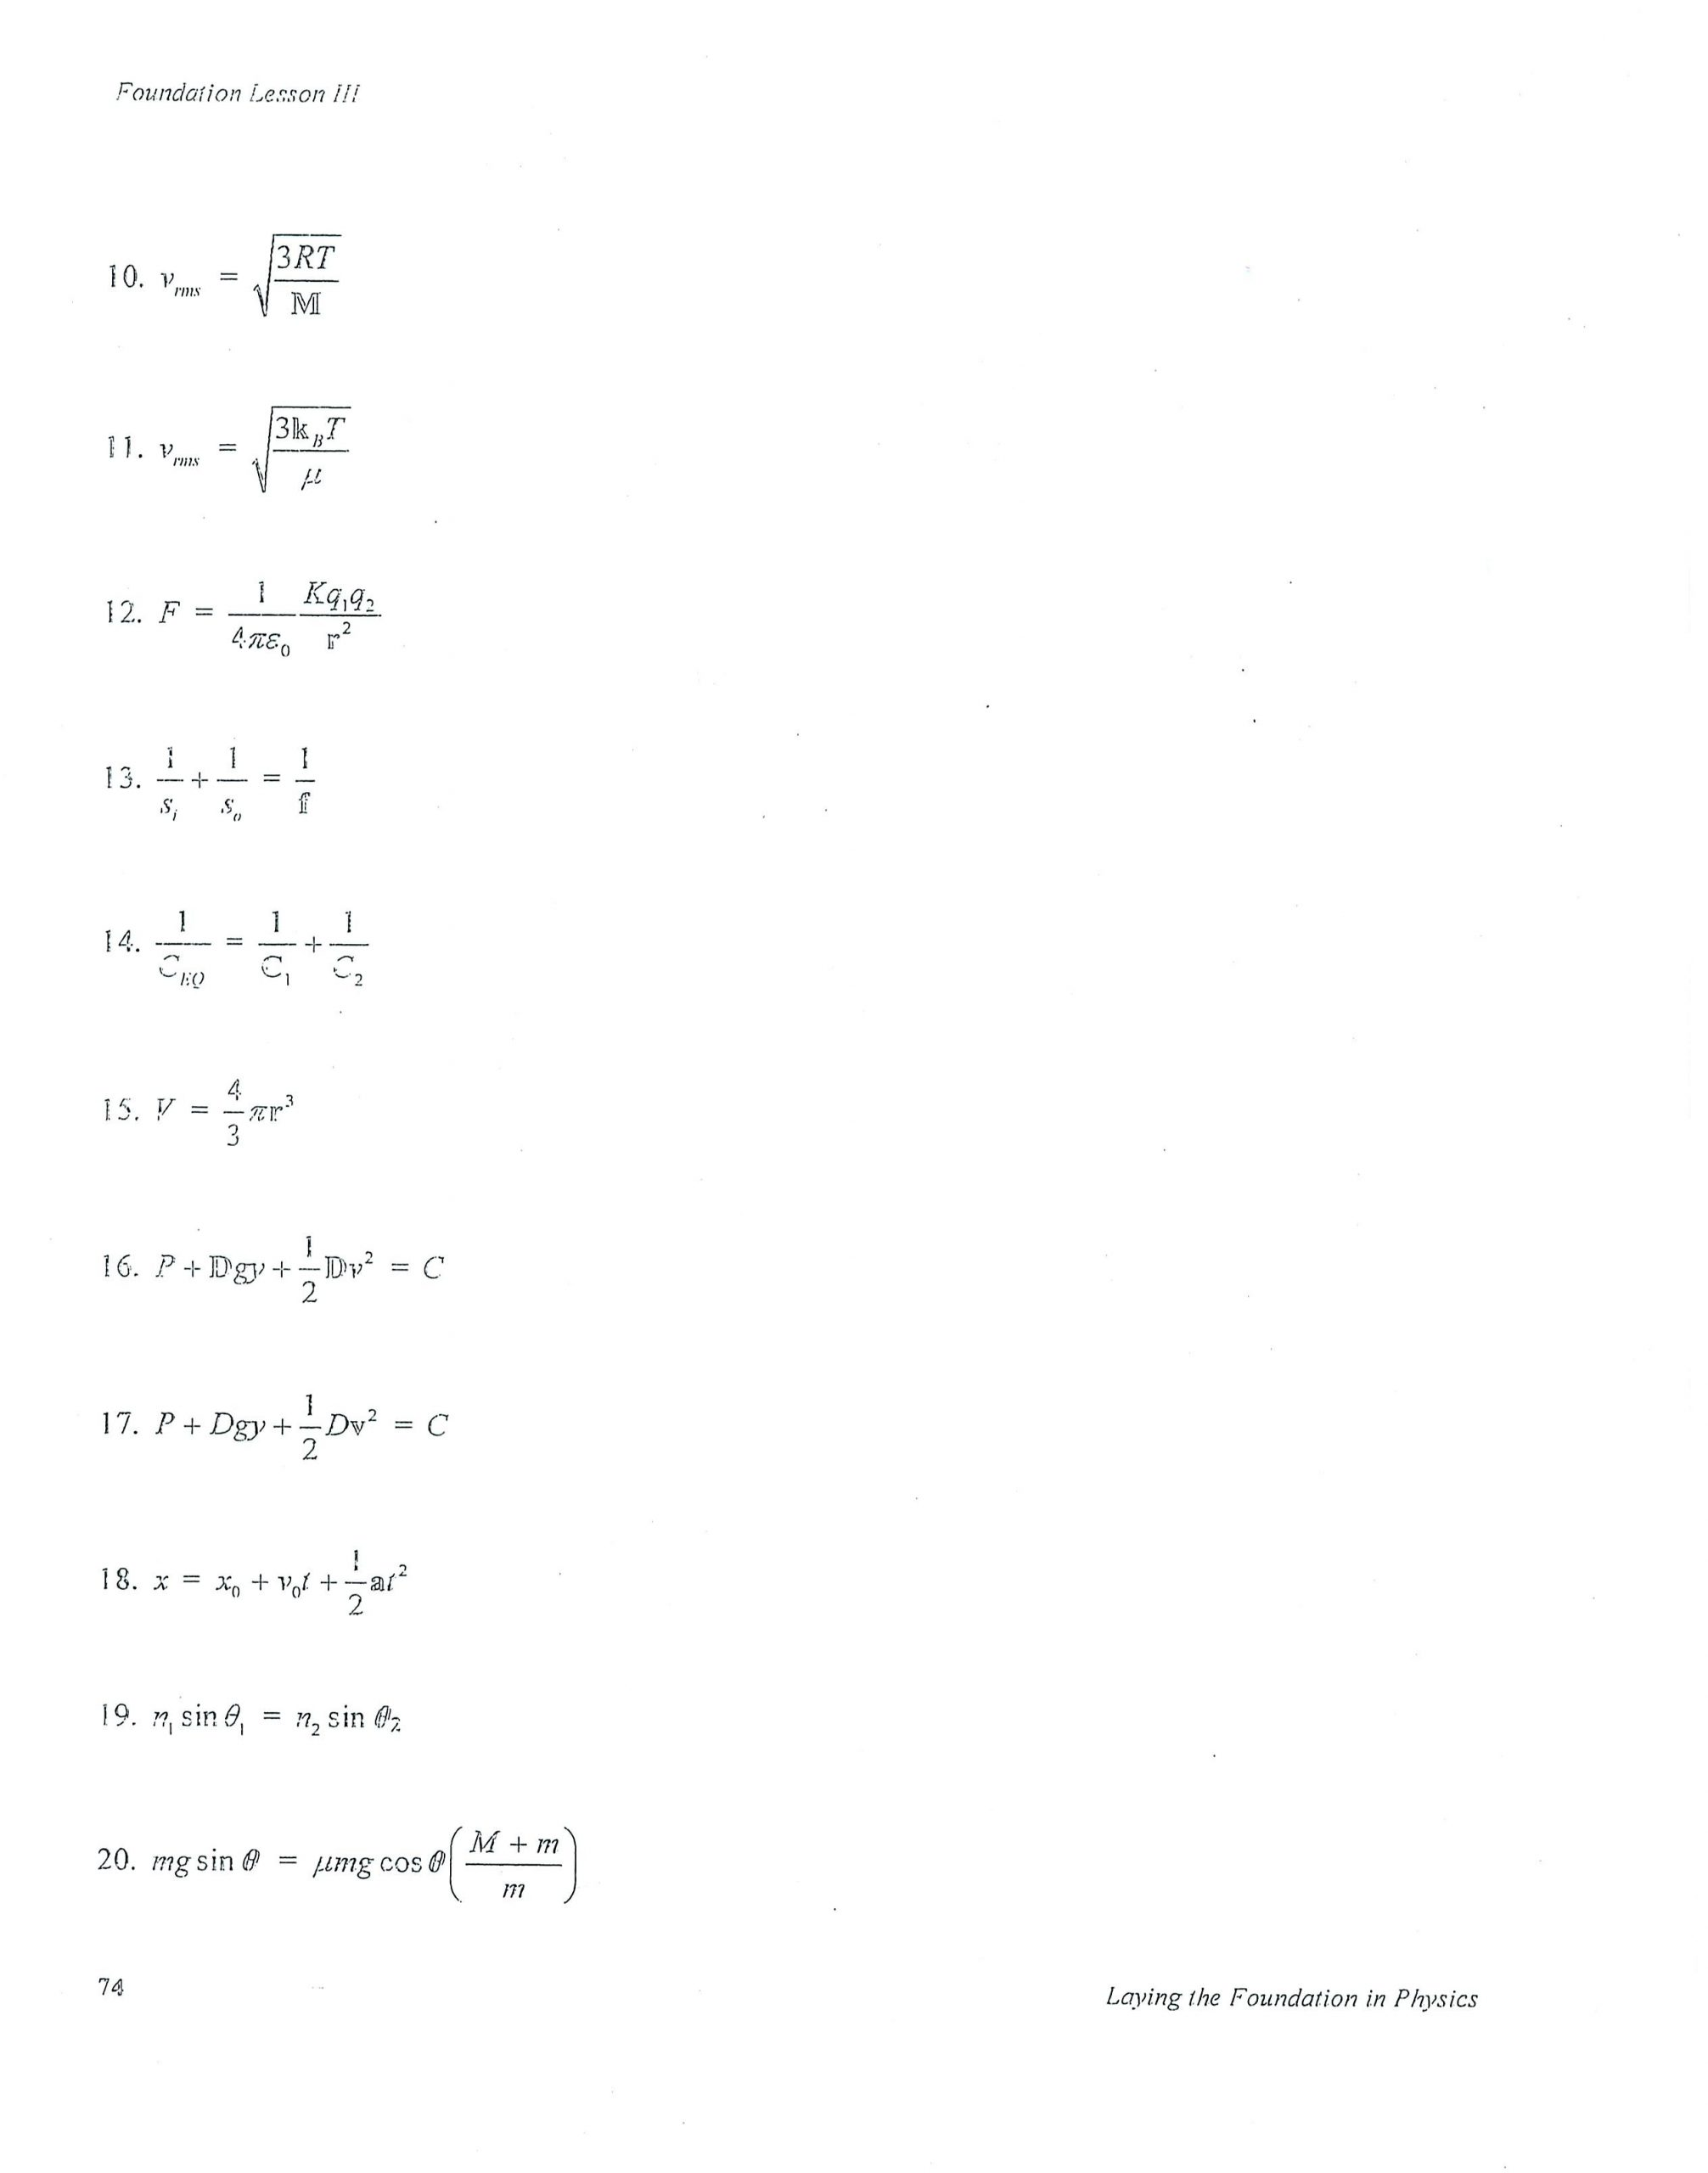 30 Literal Equations Worksheet Answer Key